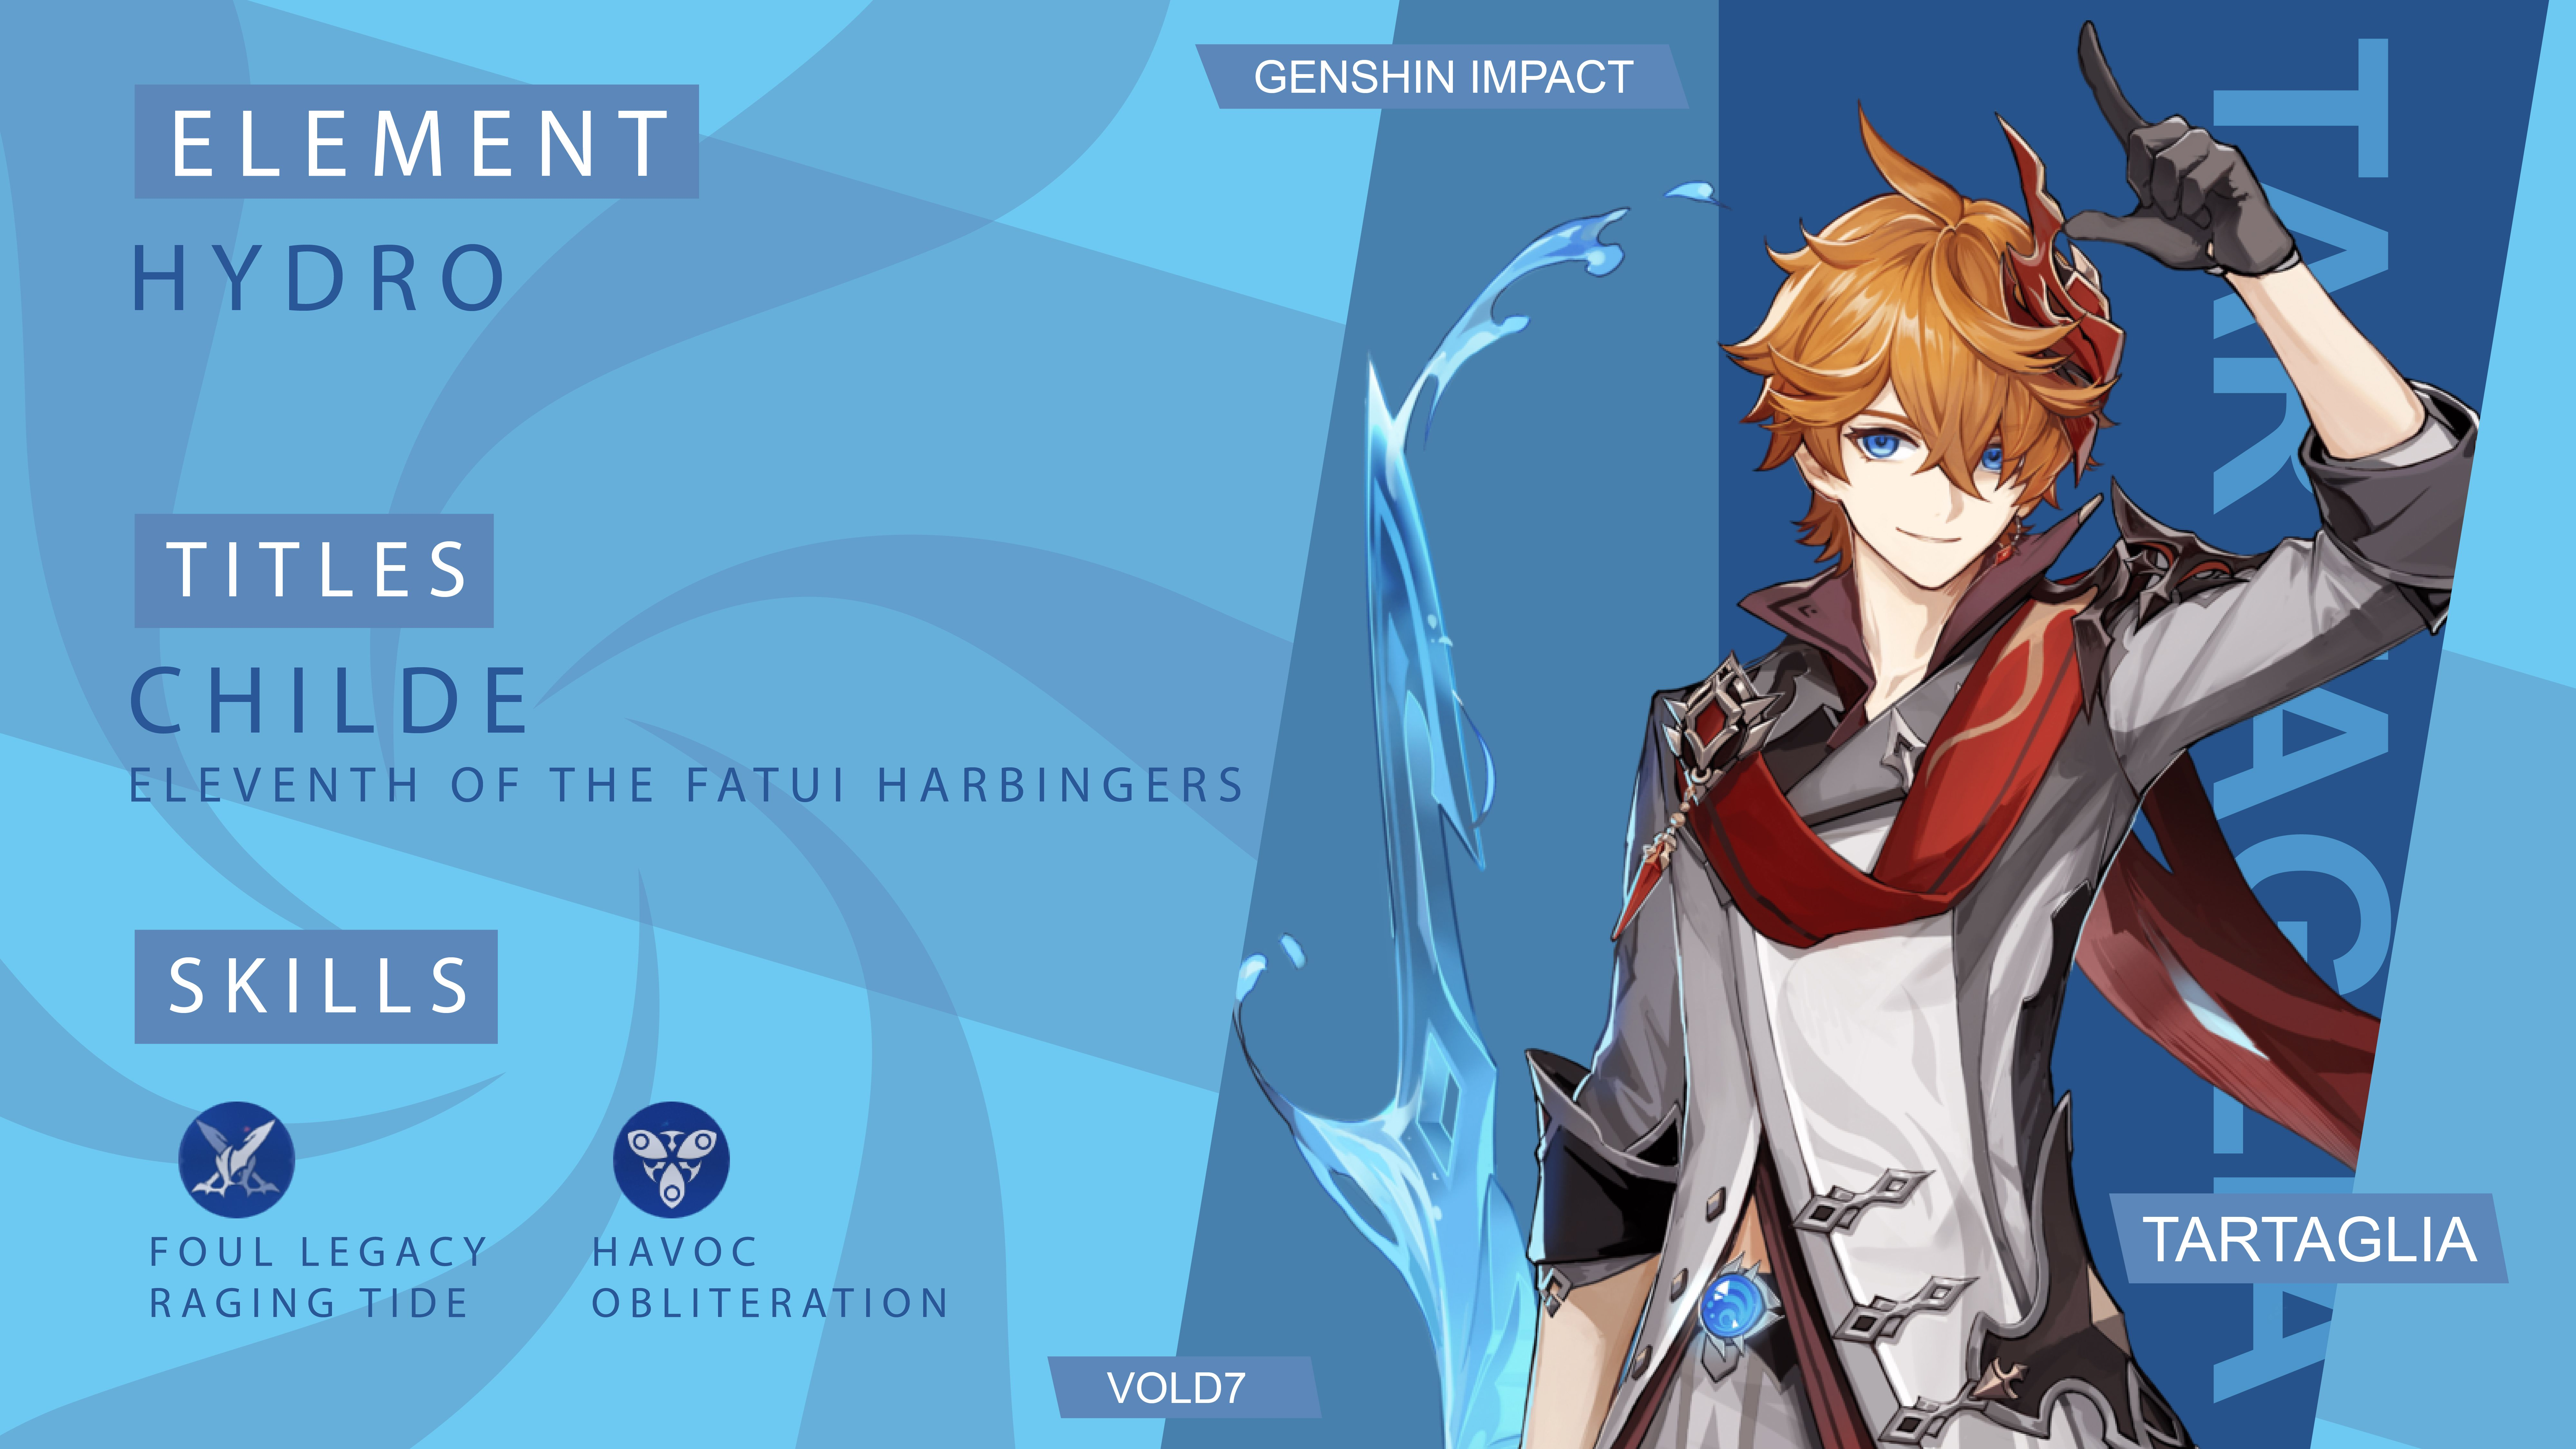 Genshin Impact Tartaglia Childe Wallpaper Pc In 2021 Wallpaper Pc Wallpaper Game Character